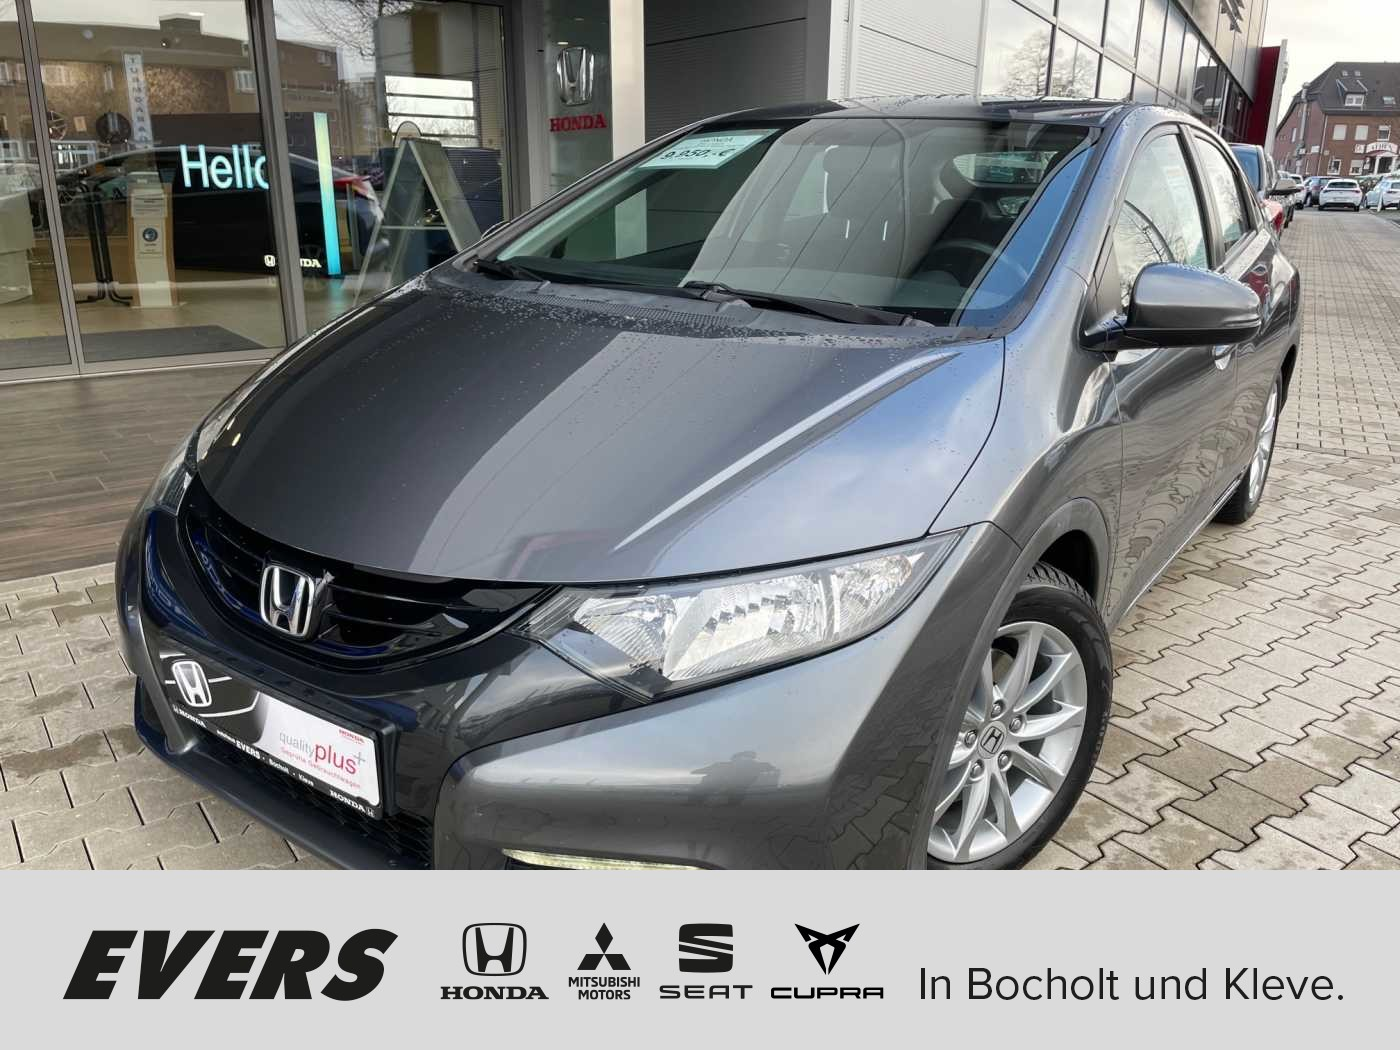 Honda Civic 1.8 i-VTEC Sport Kamera LM17', Jahr 2013, Benzin